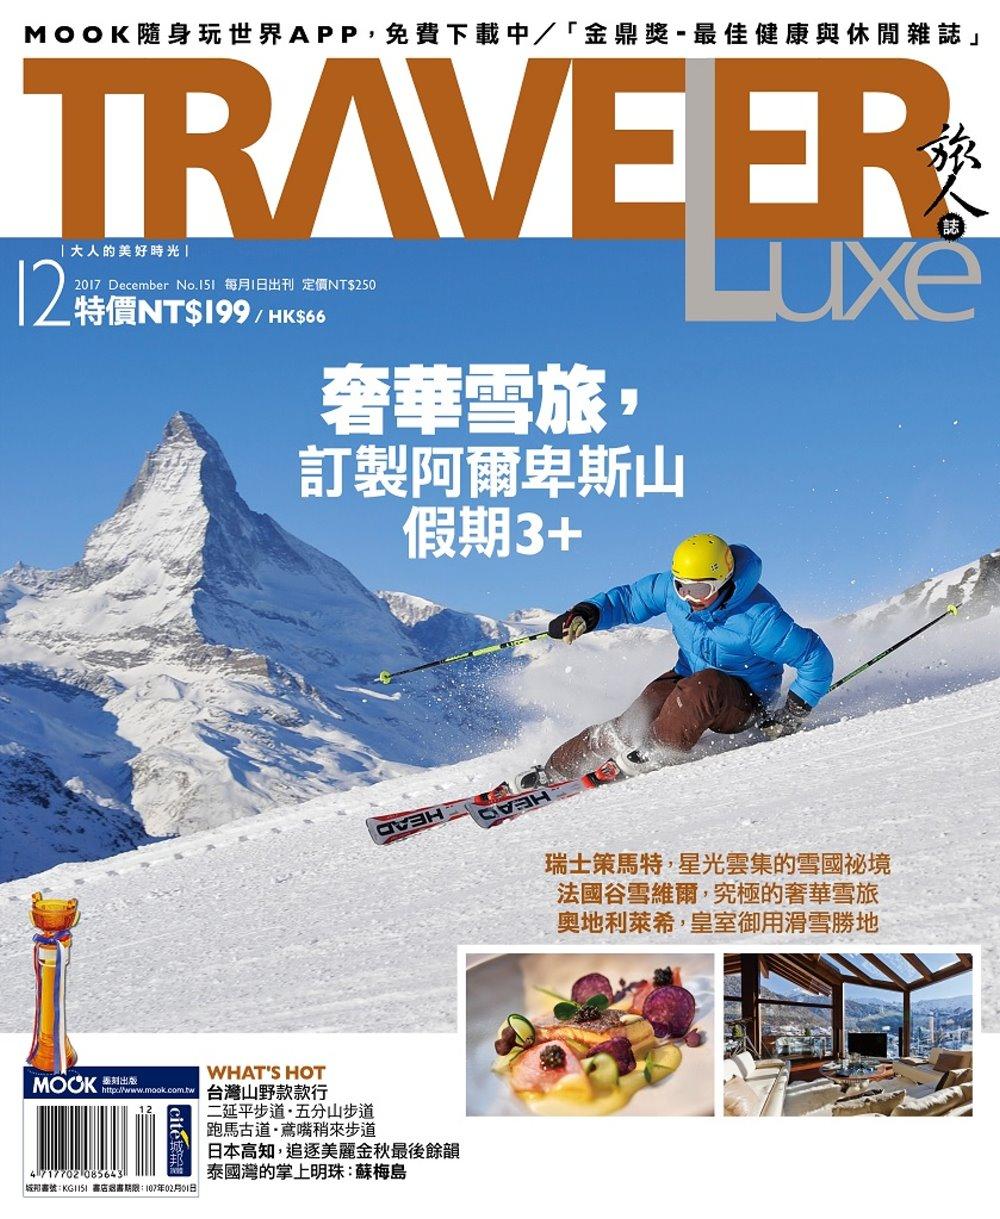 TRAVELER LUXE 旅人誌 12月號/2017 第151期